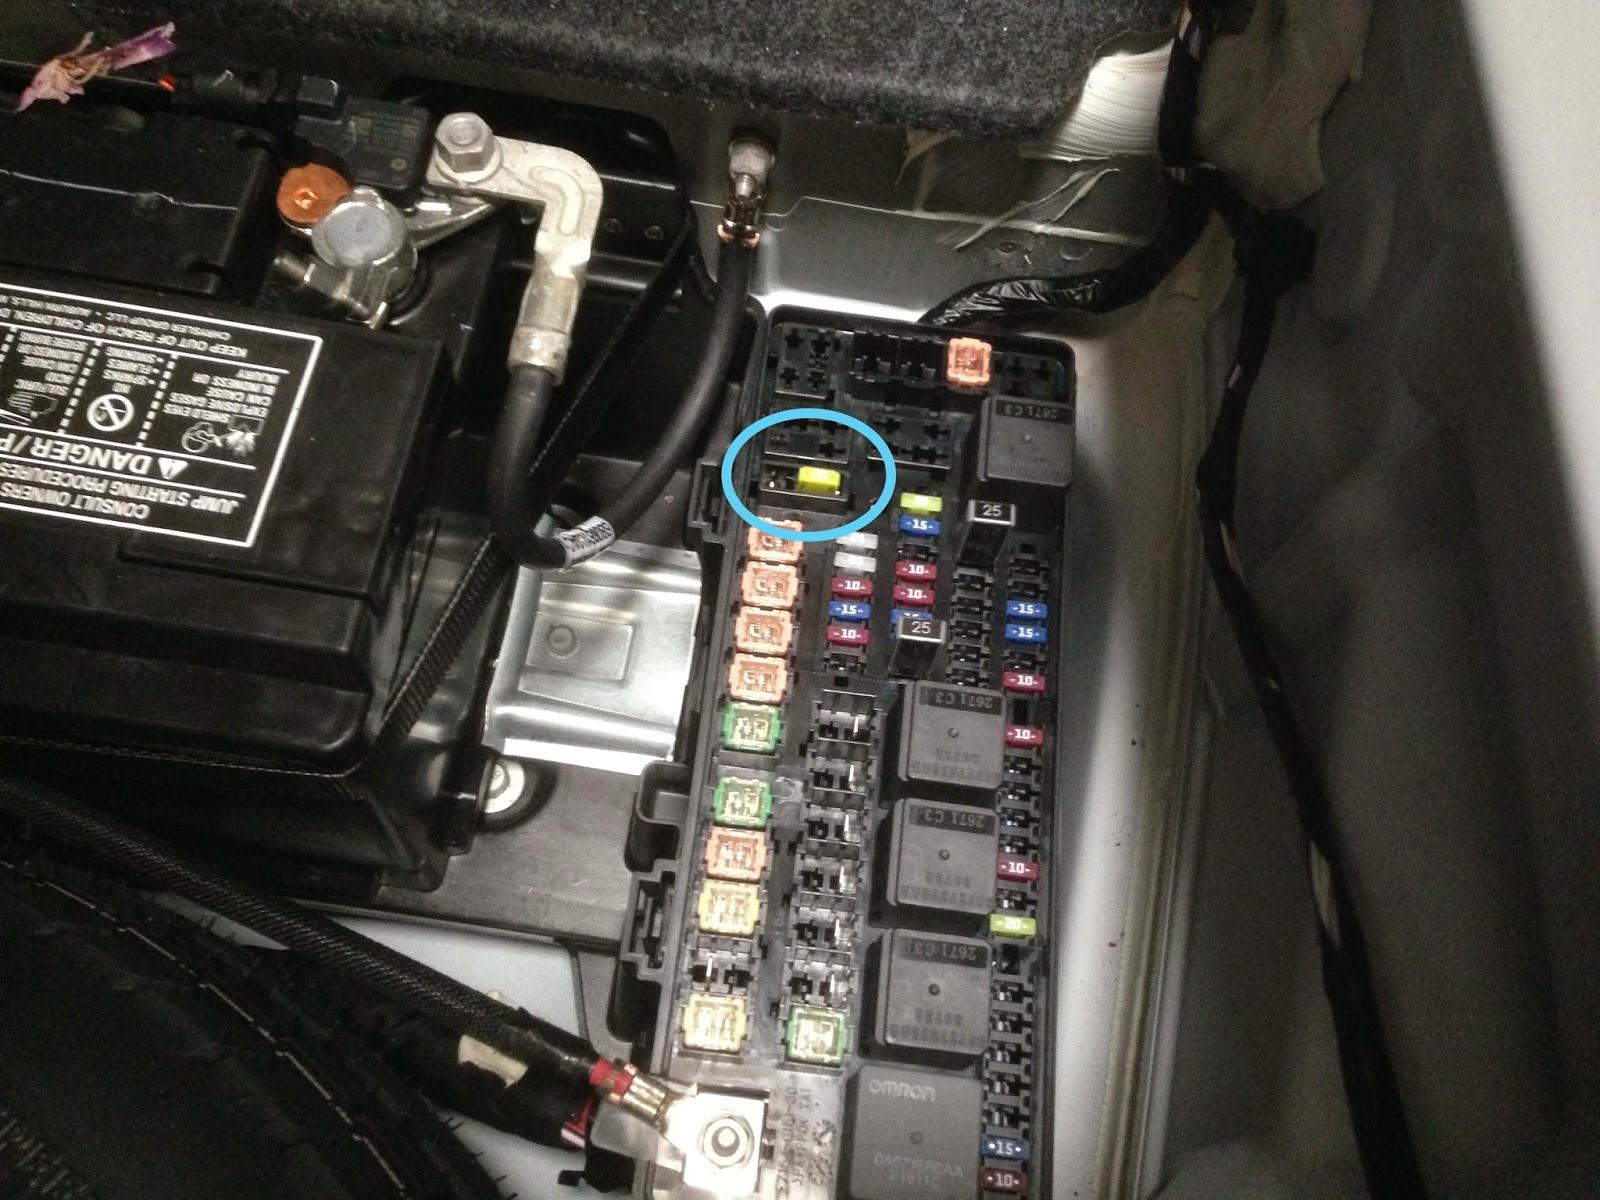 medium resolution of pontiac g6 cigarette lighter fuse image details cigarette lighter fuse location chrysler dodge jeep